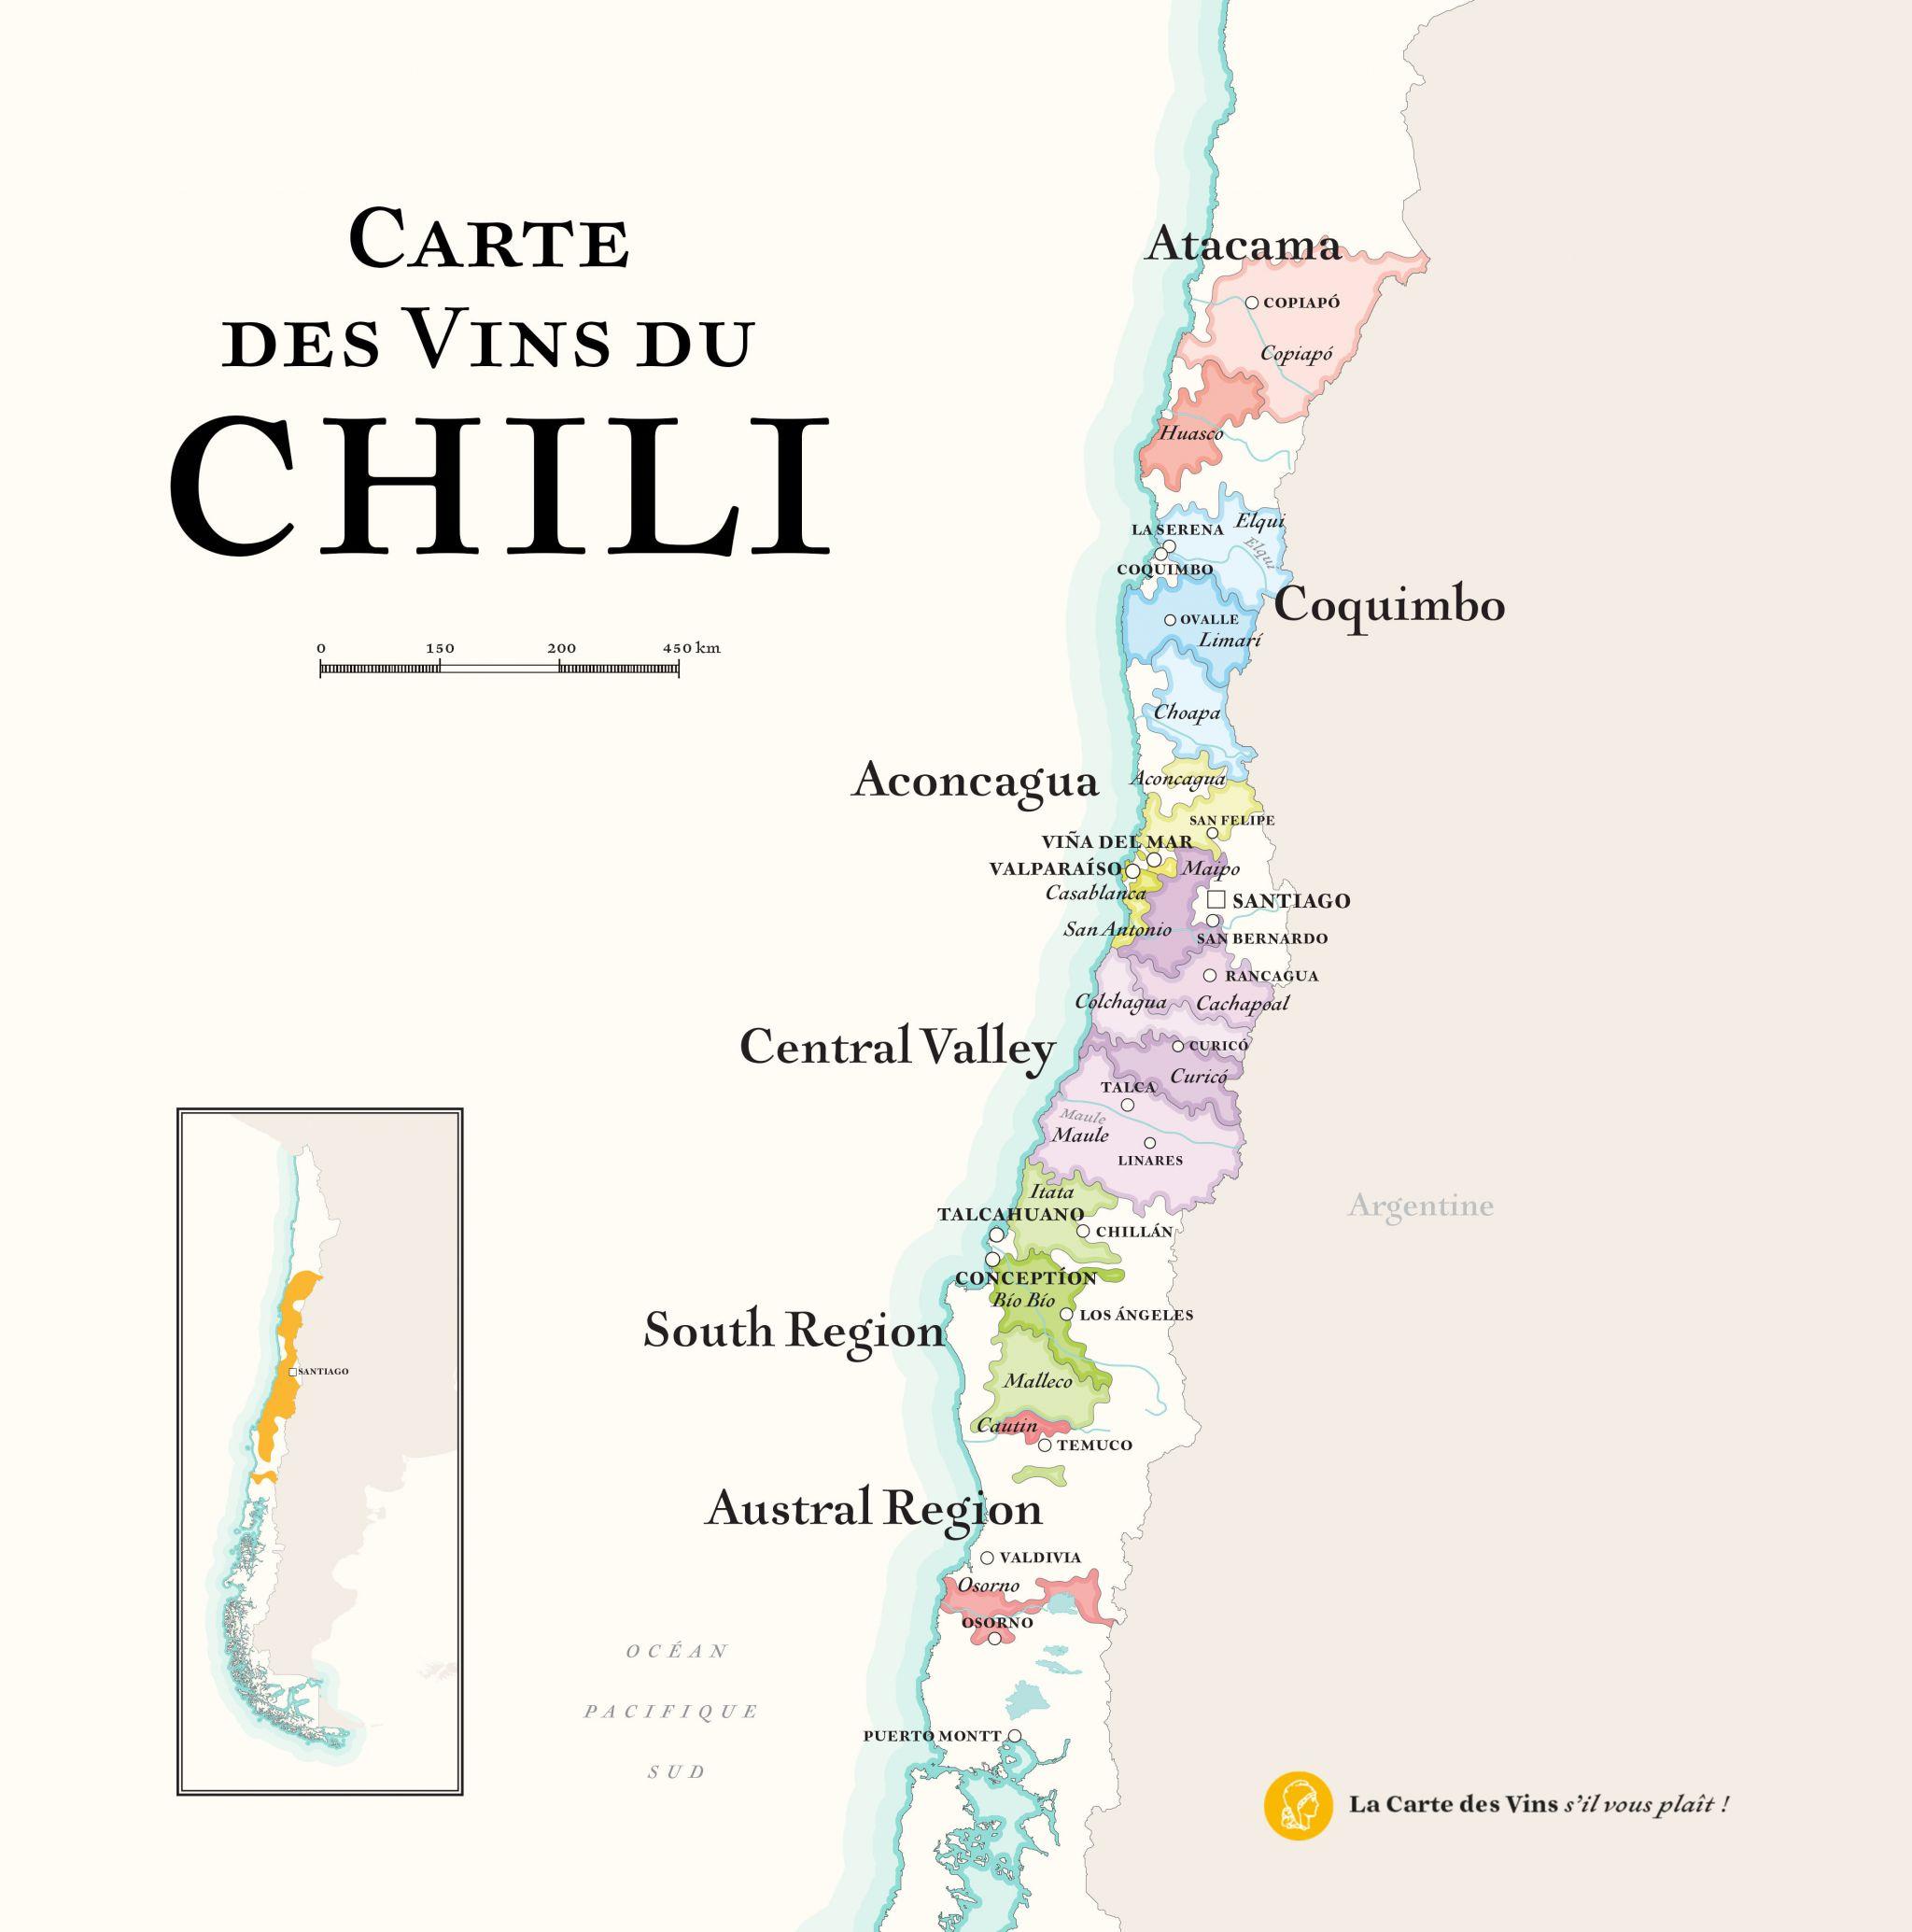 Carte-vins-Chili-wine-map